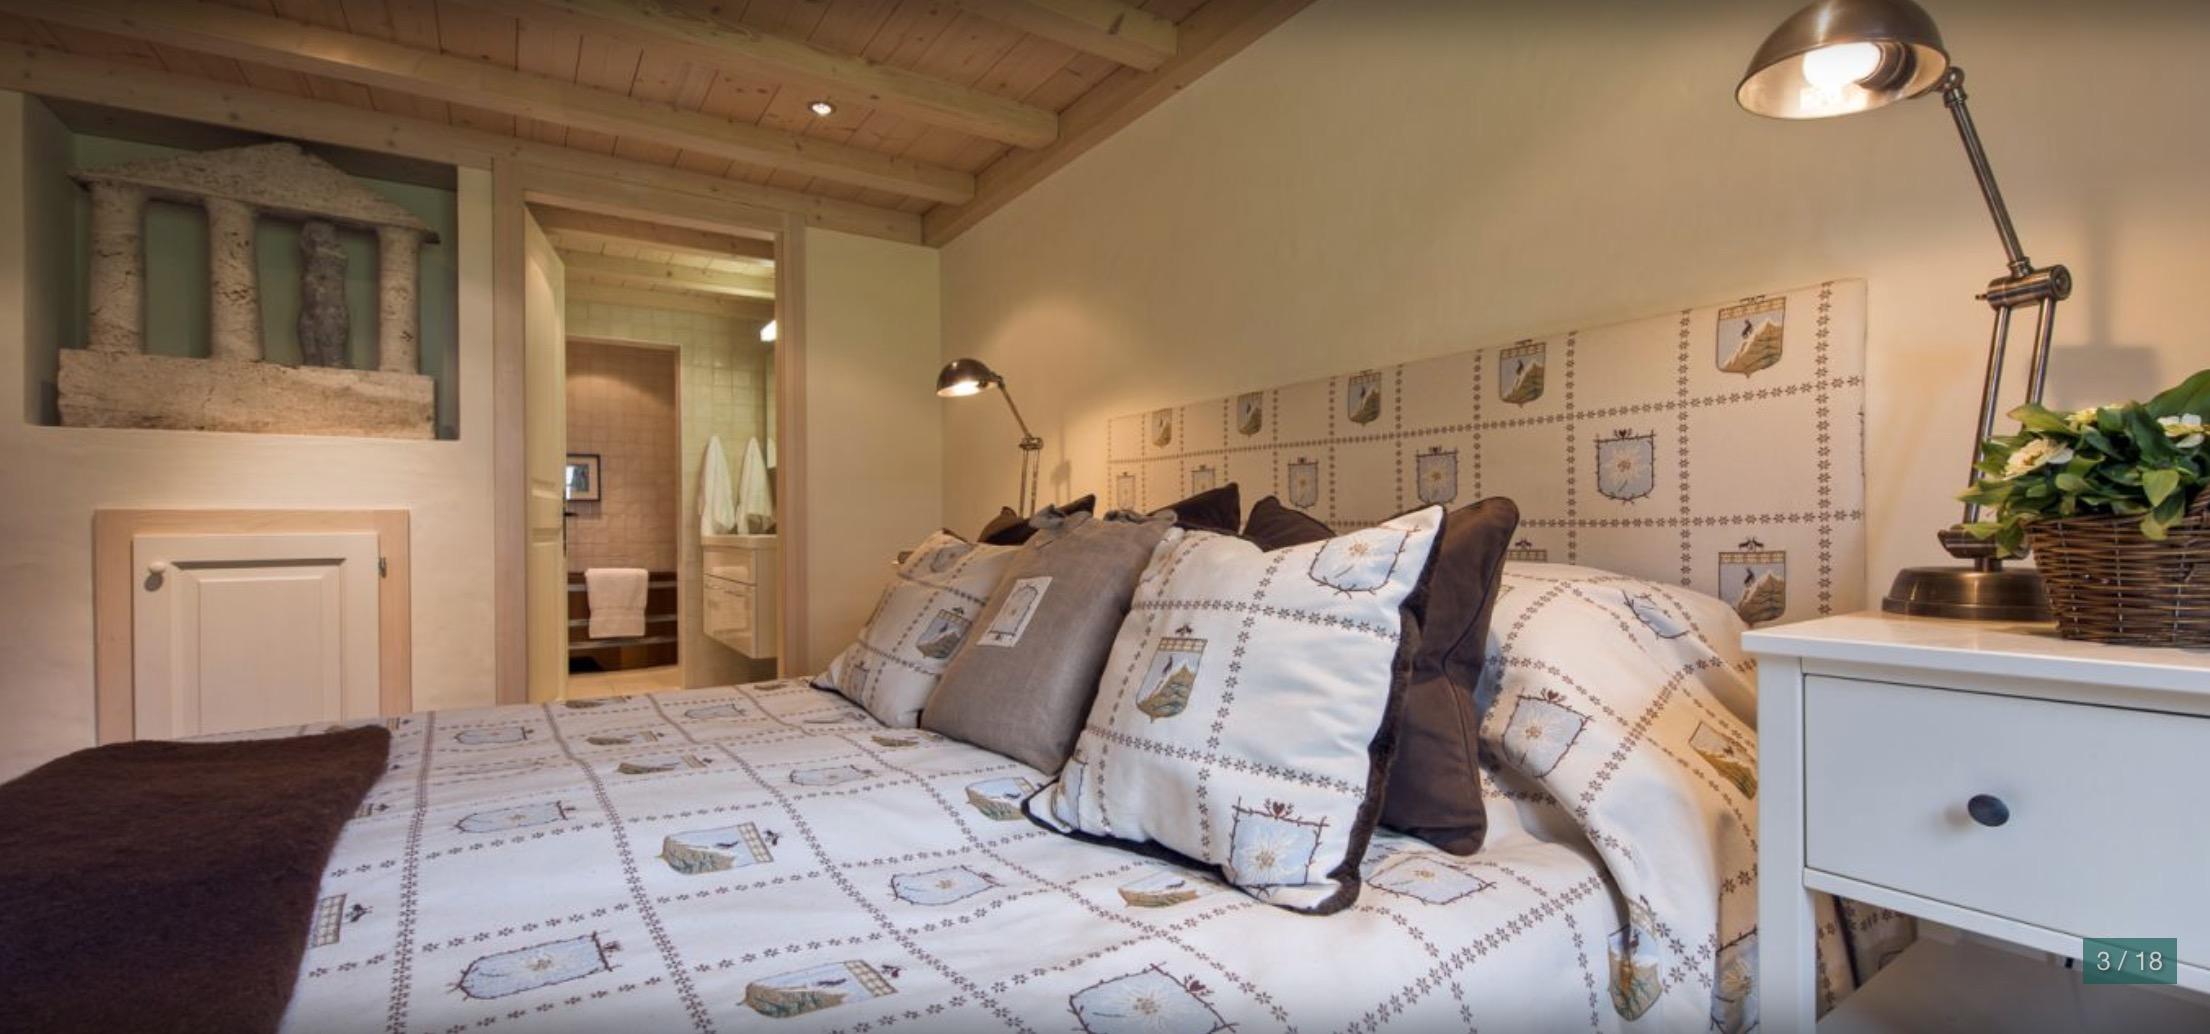 Pentahouse fayard master bedroom verbier